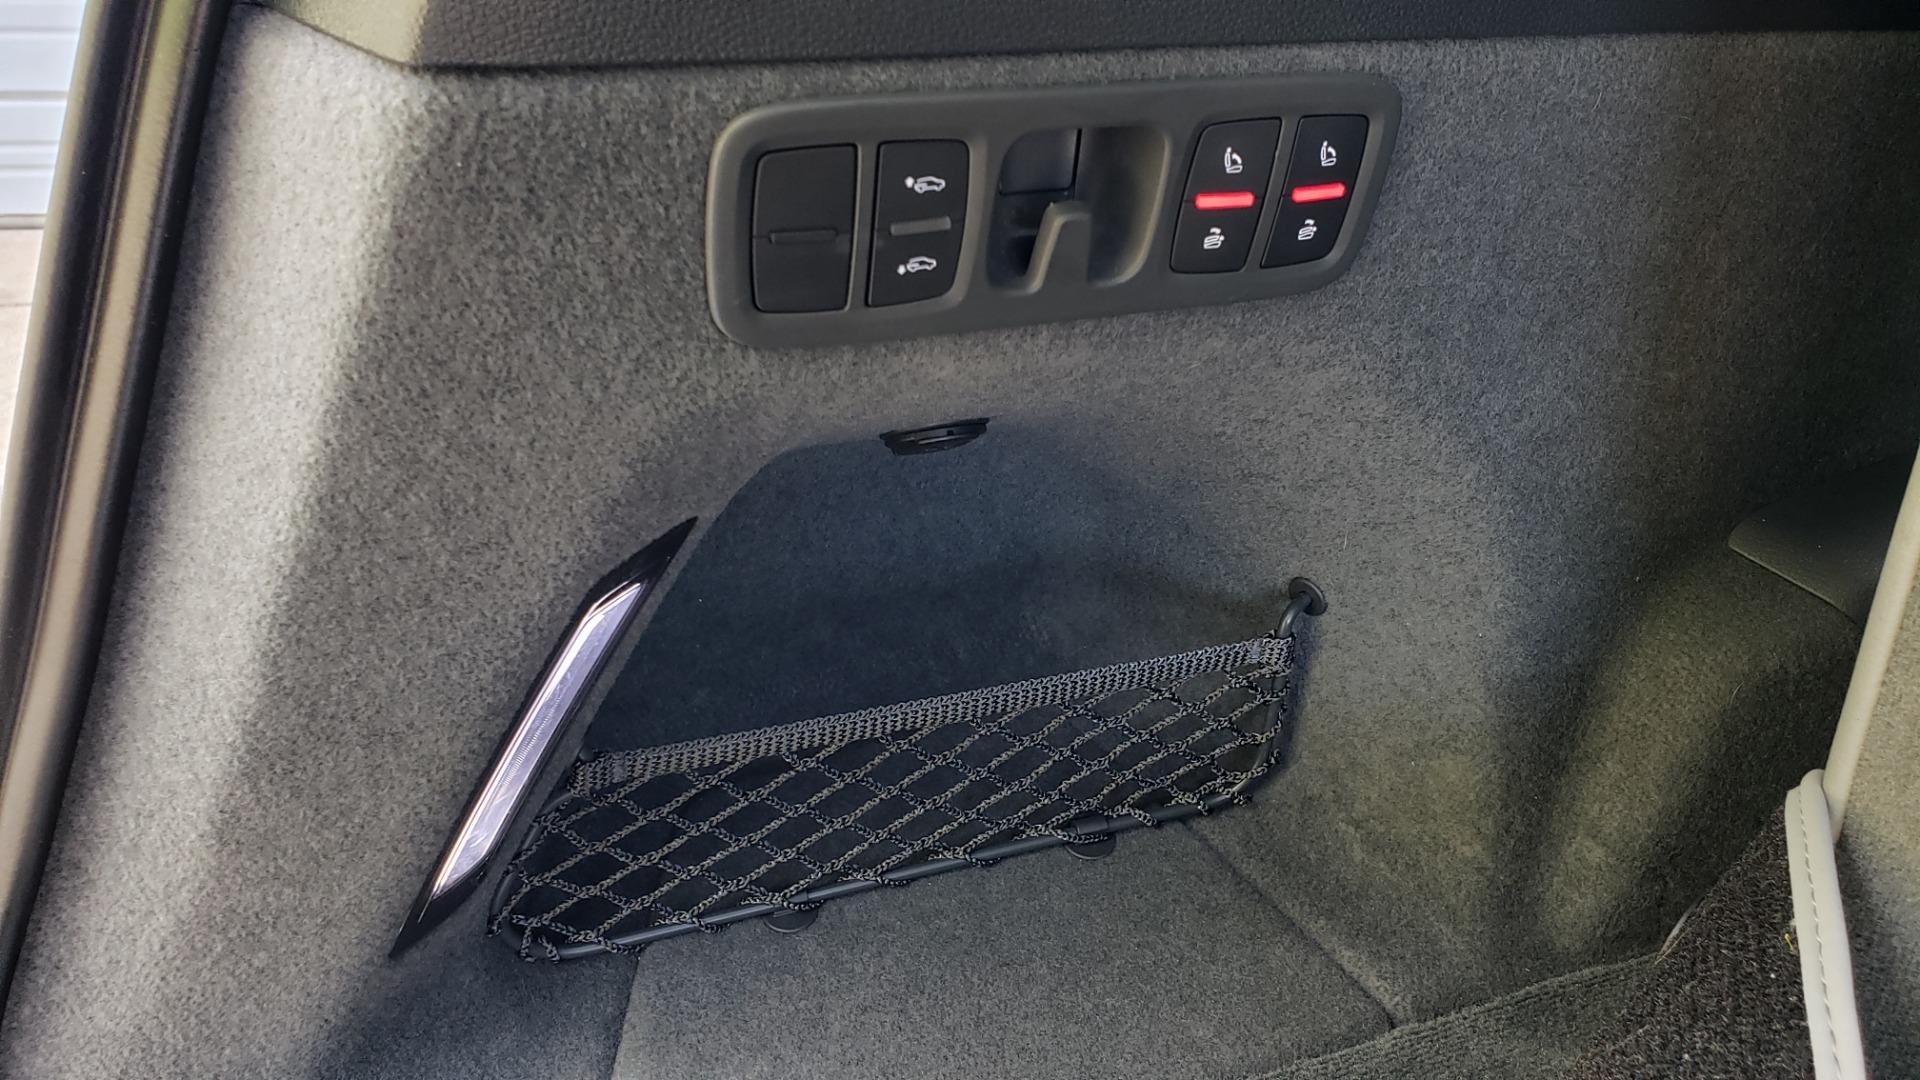 Used 2018 Audi Q7 PRESTIGE TIPTRONIC / NAV / SUNROOF / ADAPTIVE PKG / DRVR ASST / CLD WTHR /  for sale $49,995 at Formula Imports in Charlotte NC 28227 68